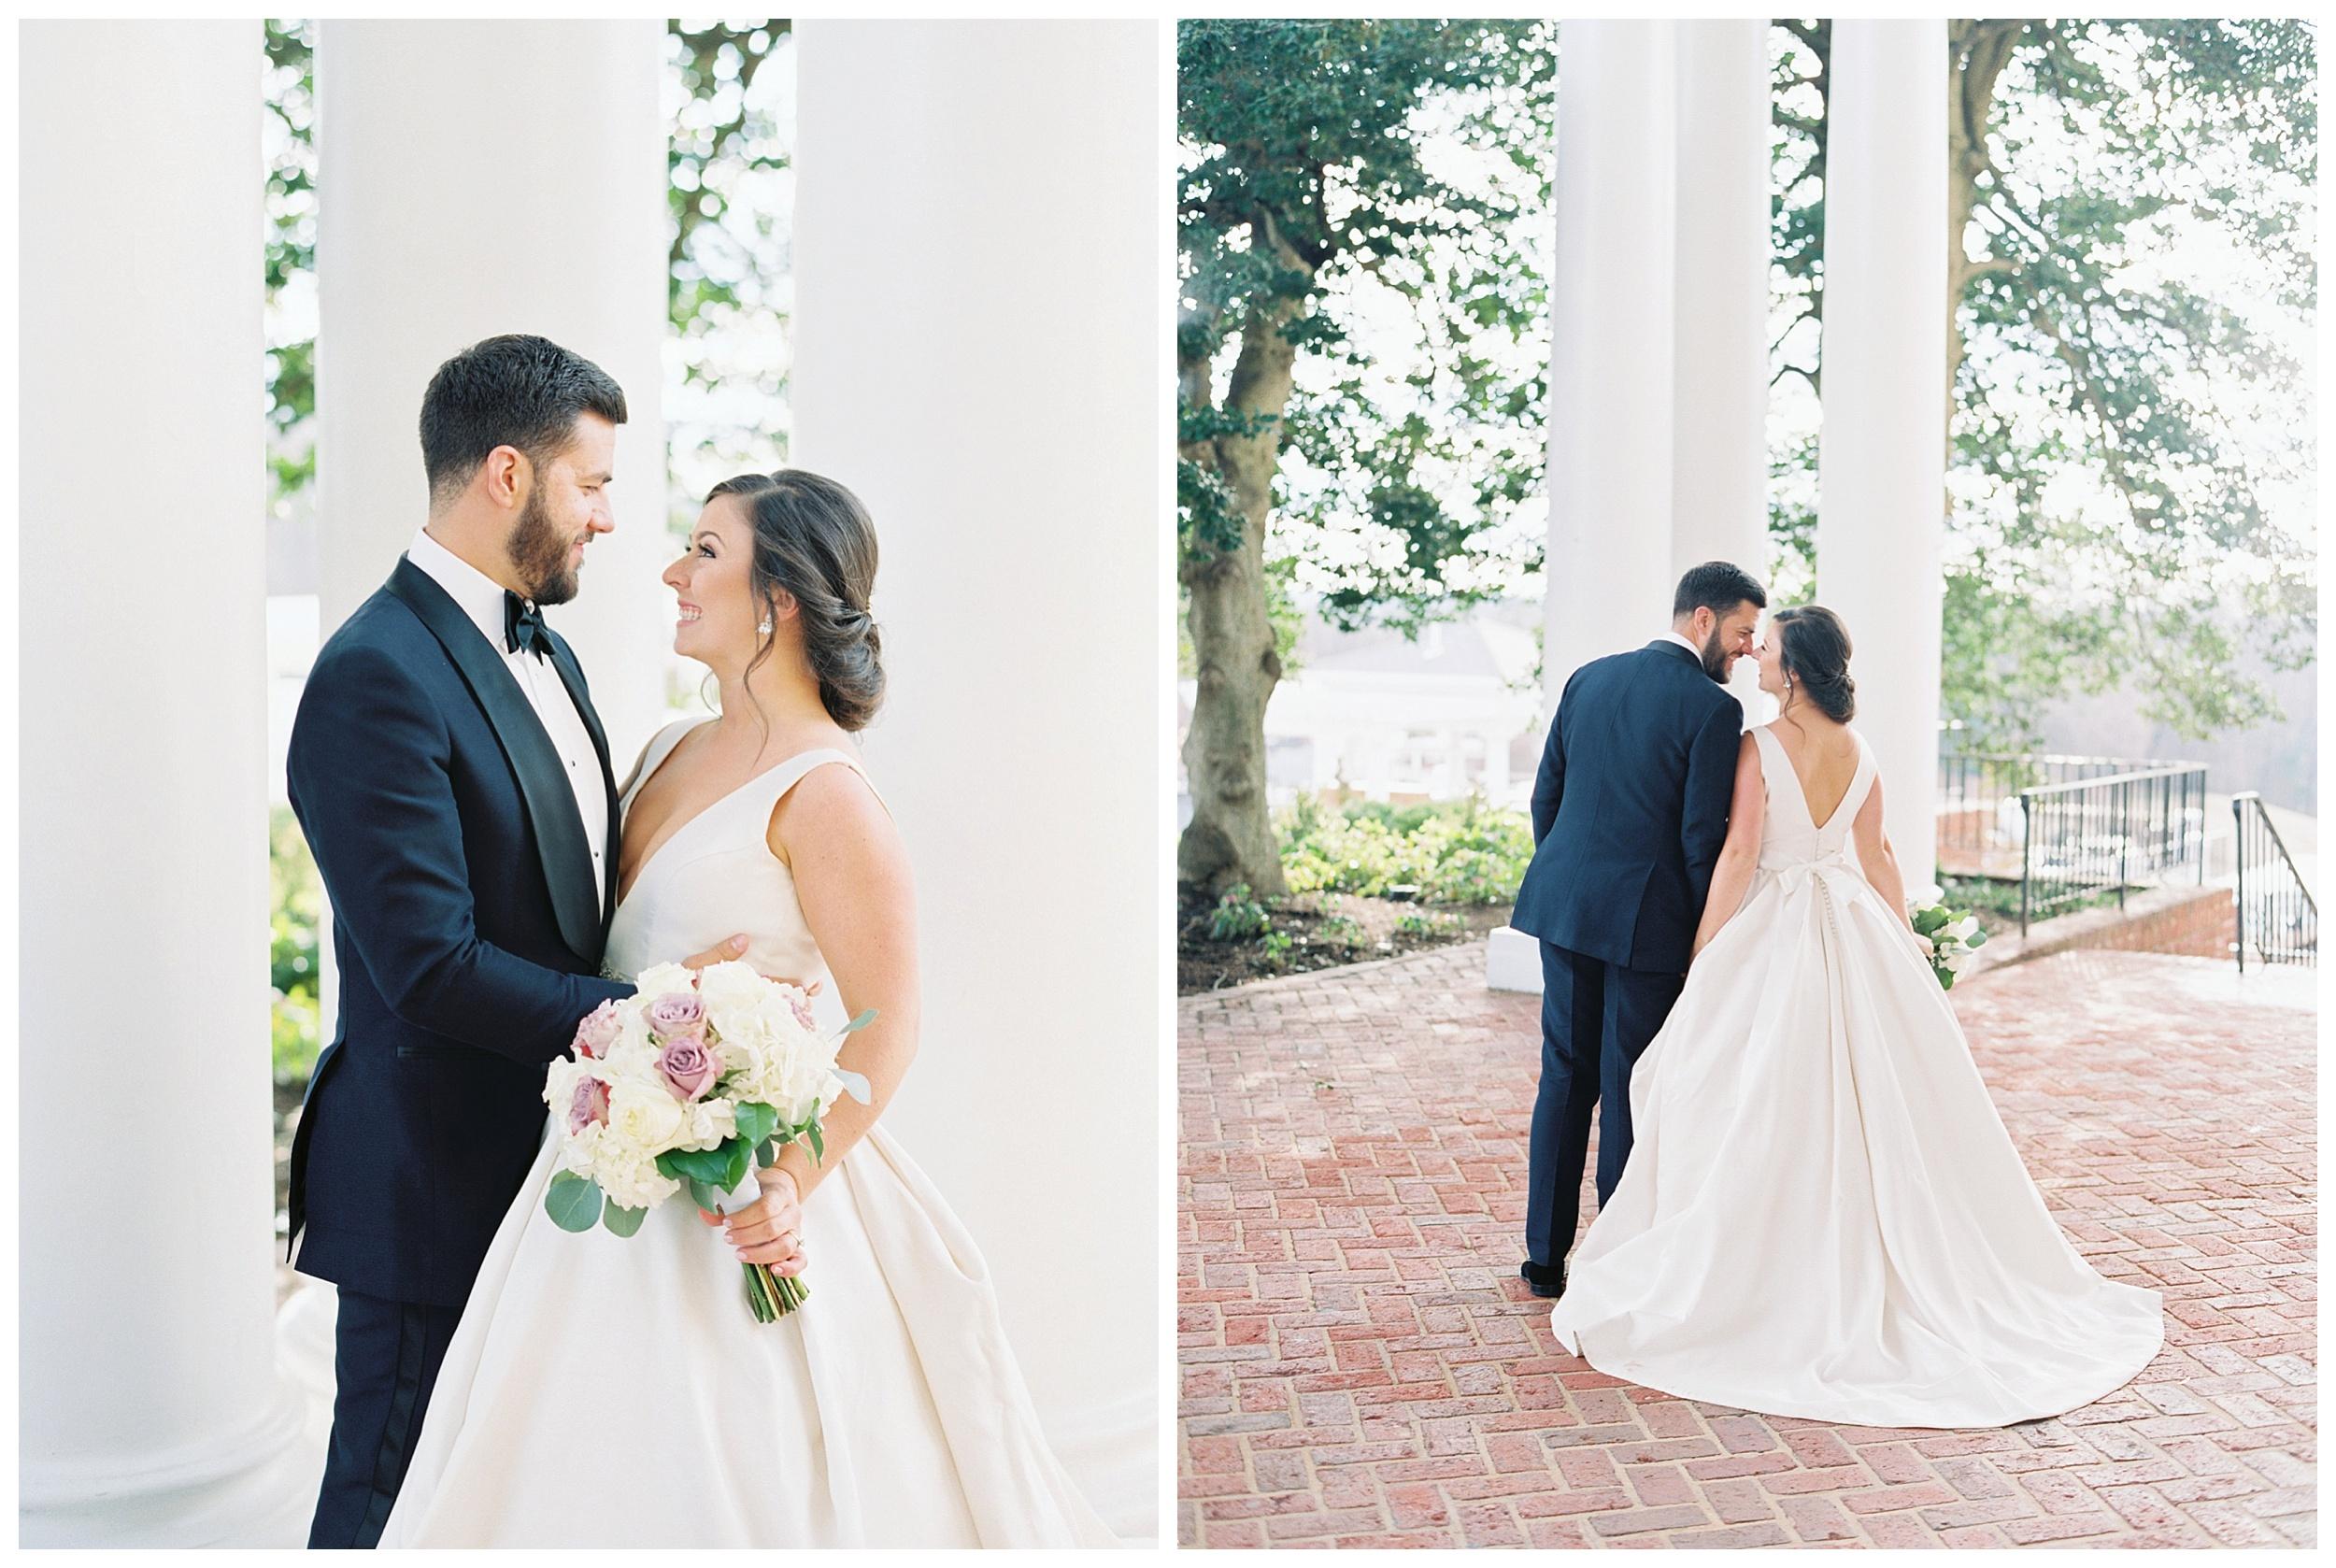 Country Club of Virginia Wedding | Richmond Wedding Photographer_0094.jpg